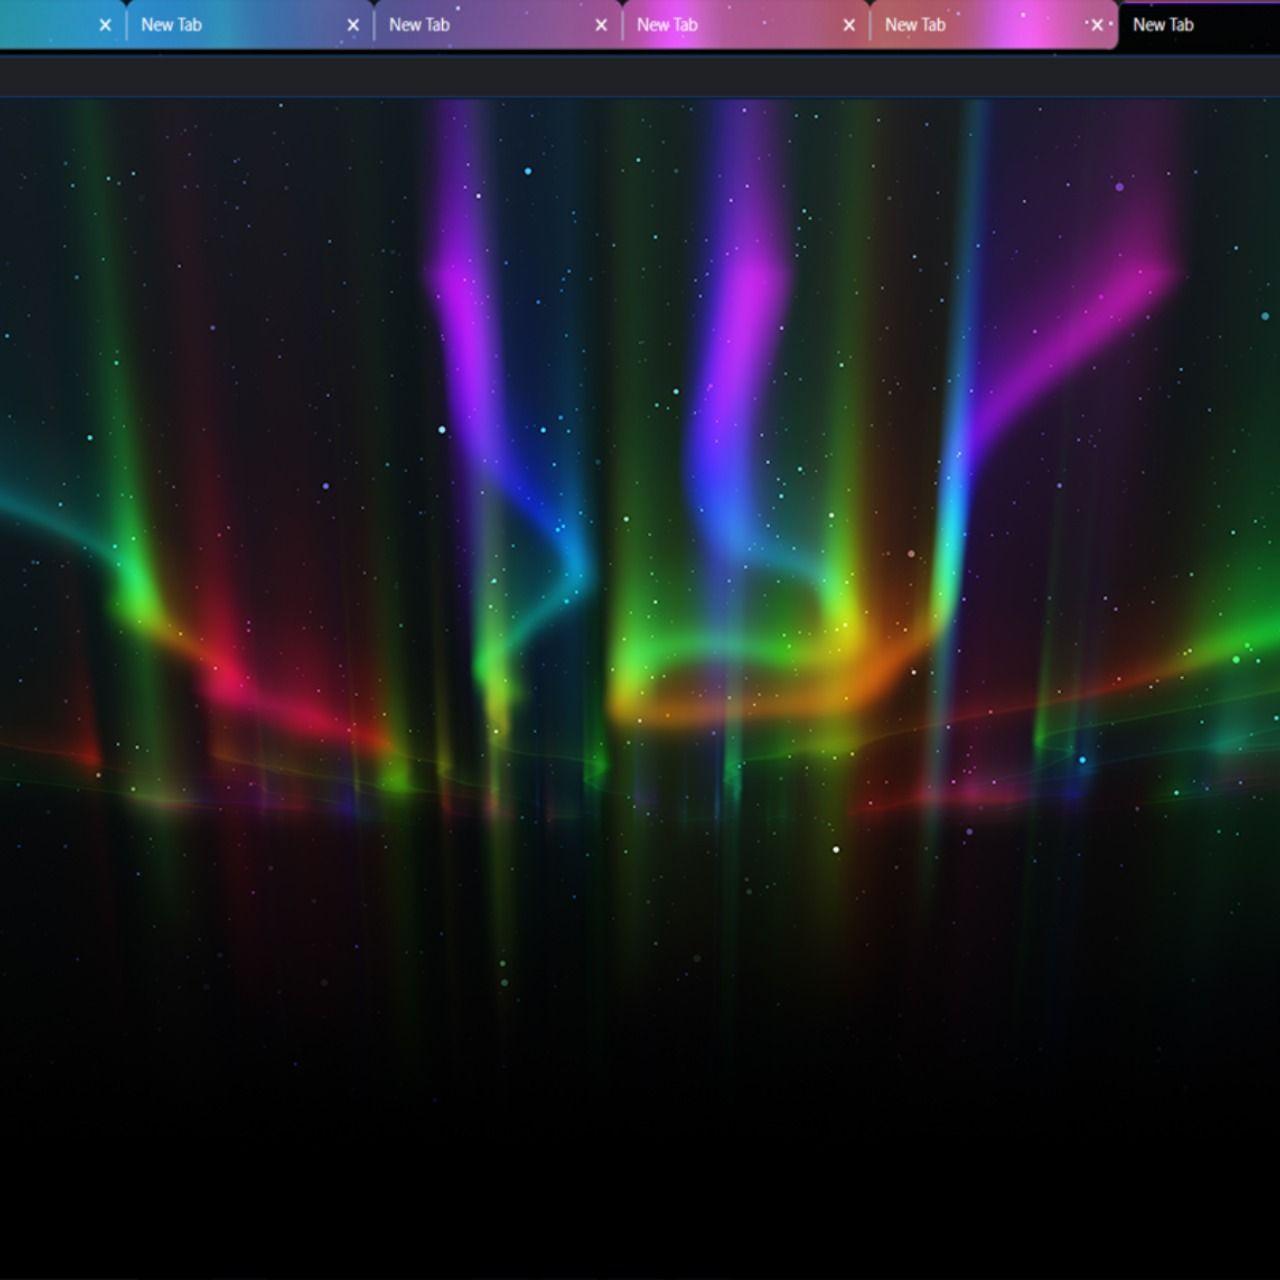 Aurora Multi Color New Tab Chrome Themes Chrome Theme Google Chrome Theme